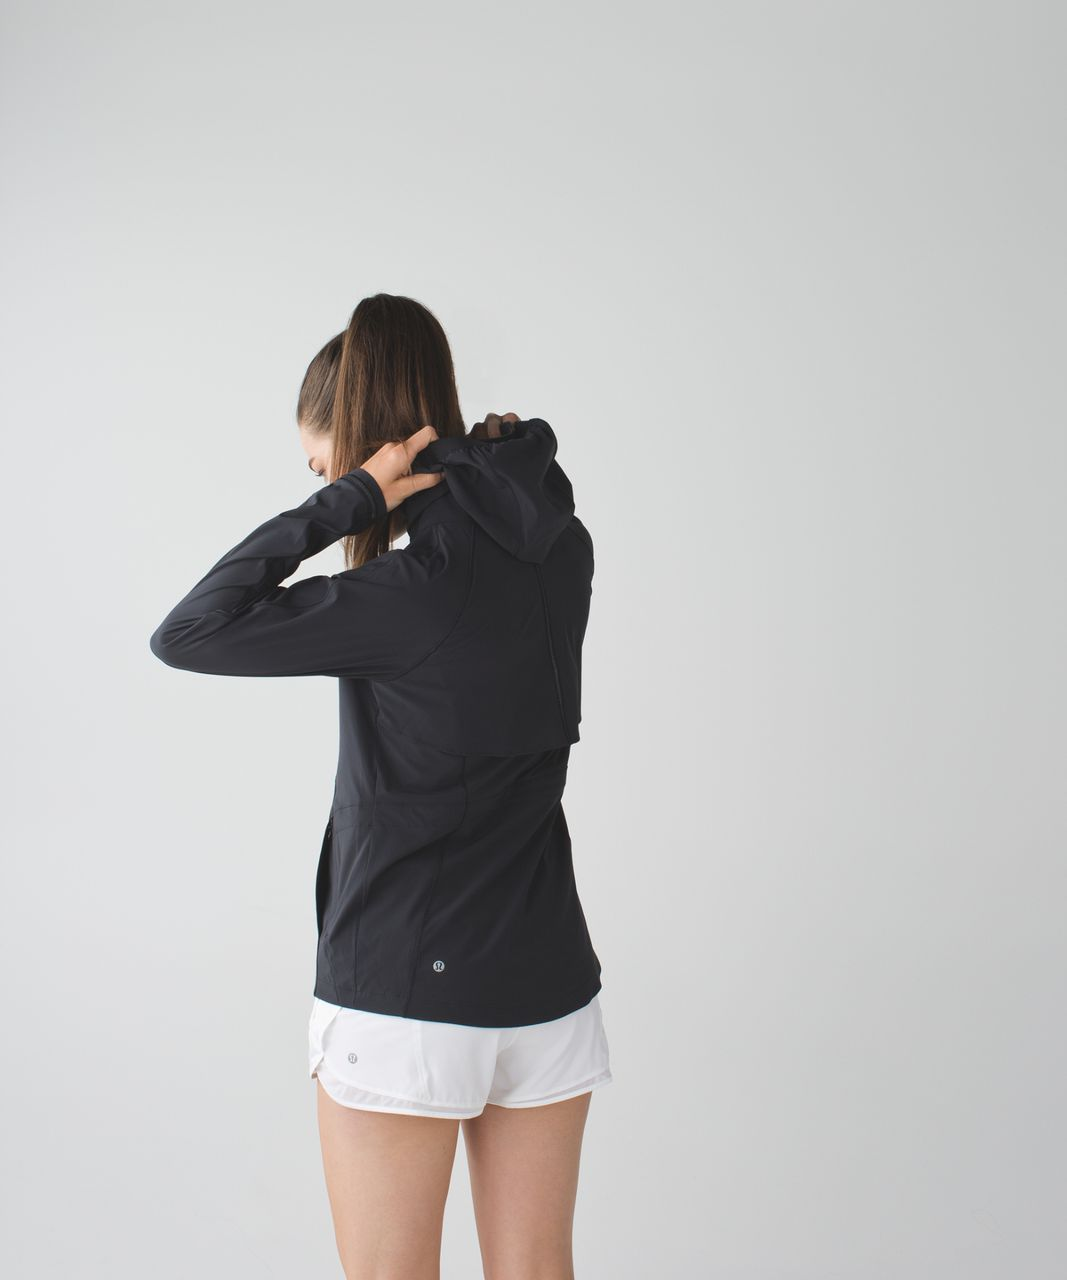 Lululemon Go The Distance Jacket - Black